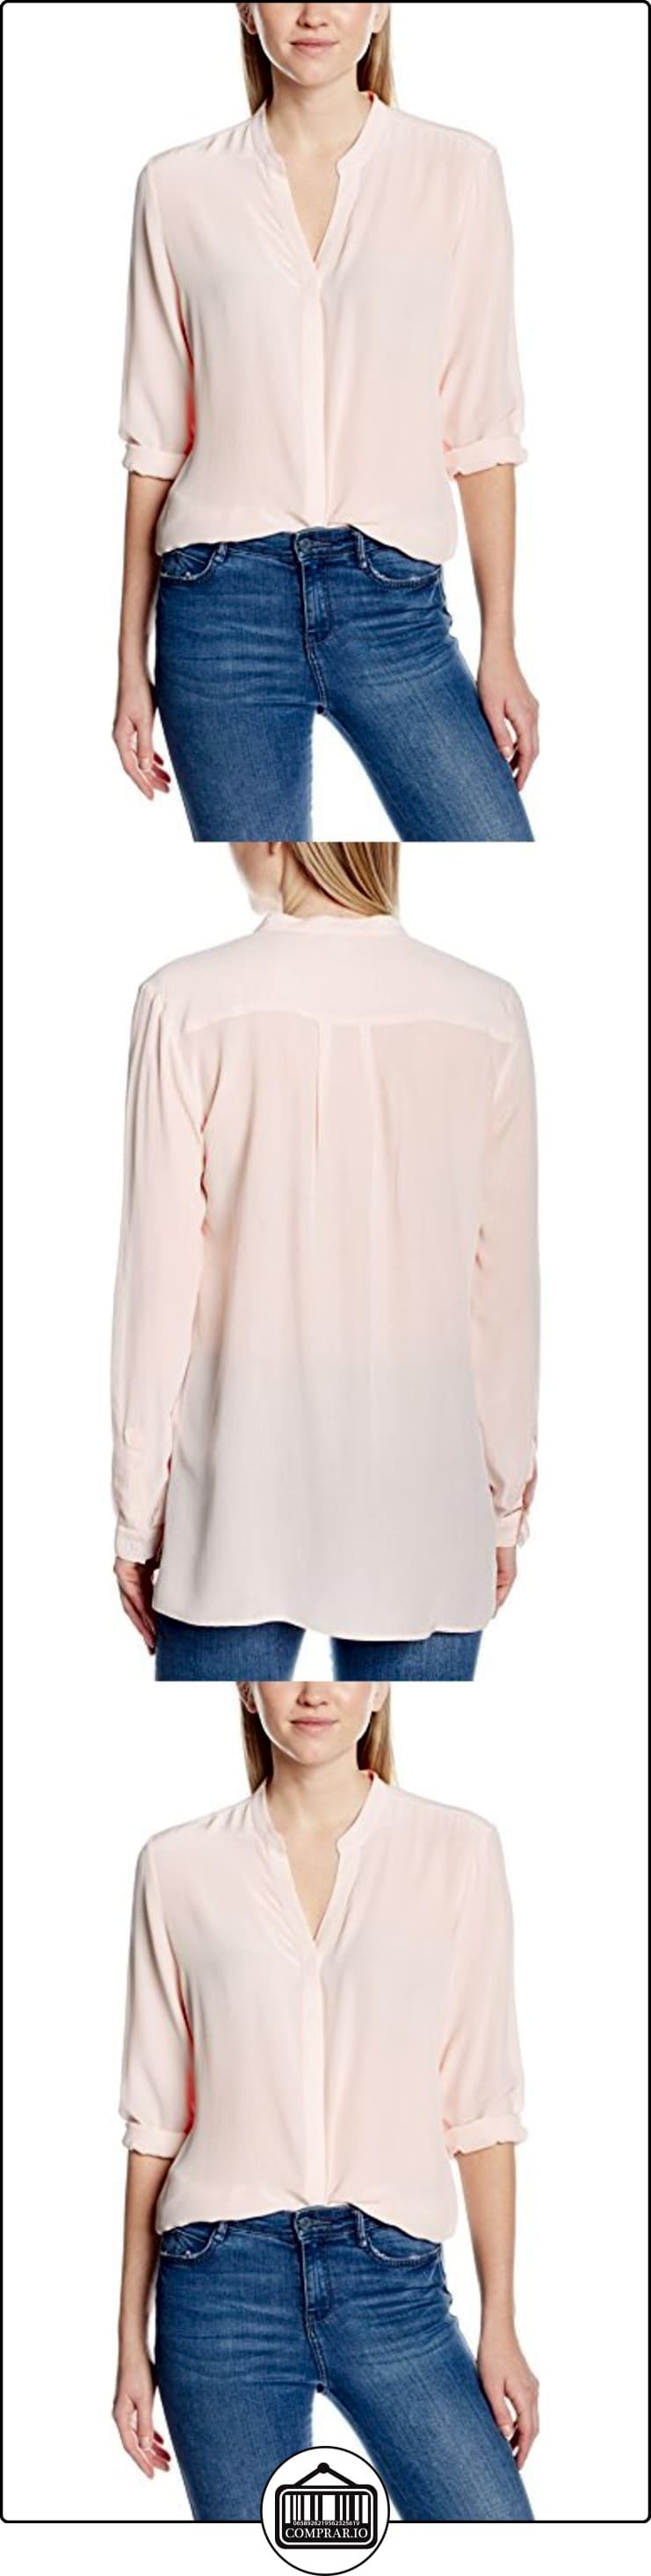 eterna FS84, Blusa para Mujer, Rosa (Rosa 54), 40  ✿ Blusas y camisas ✿